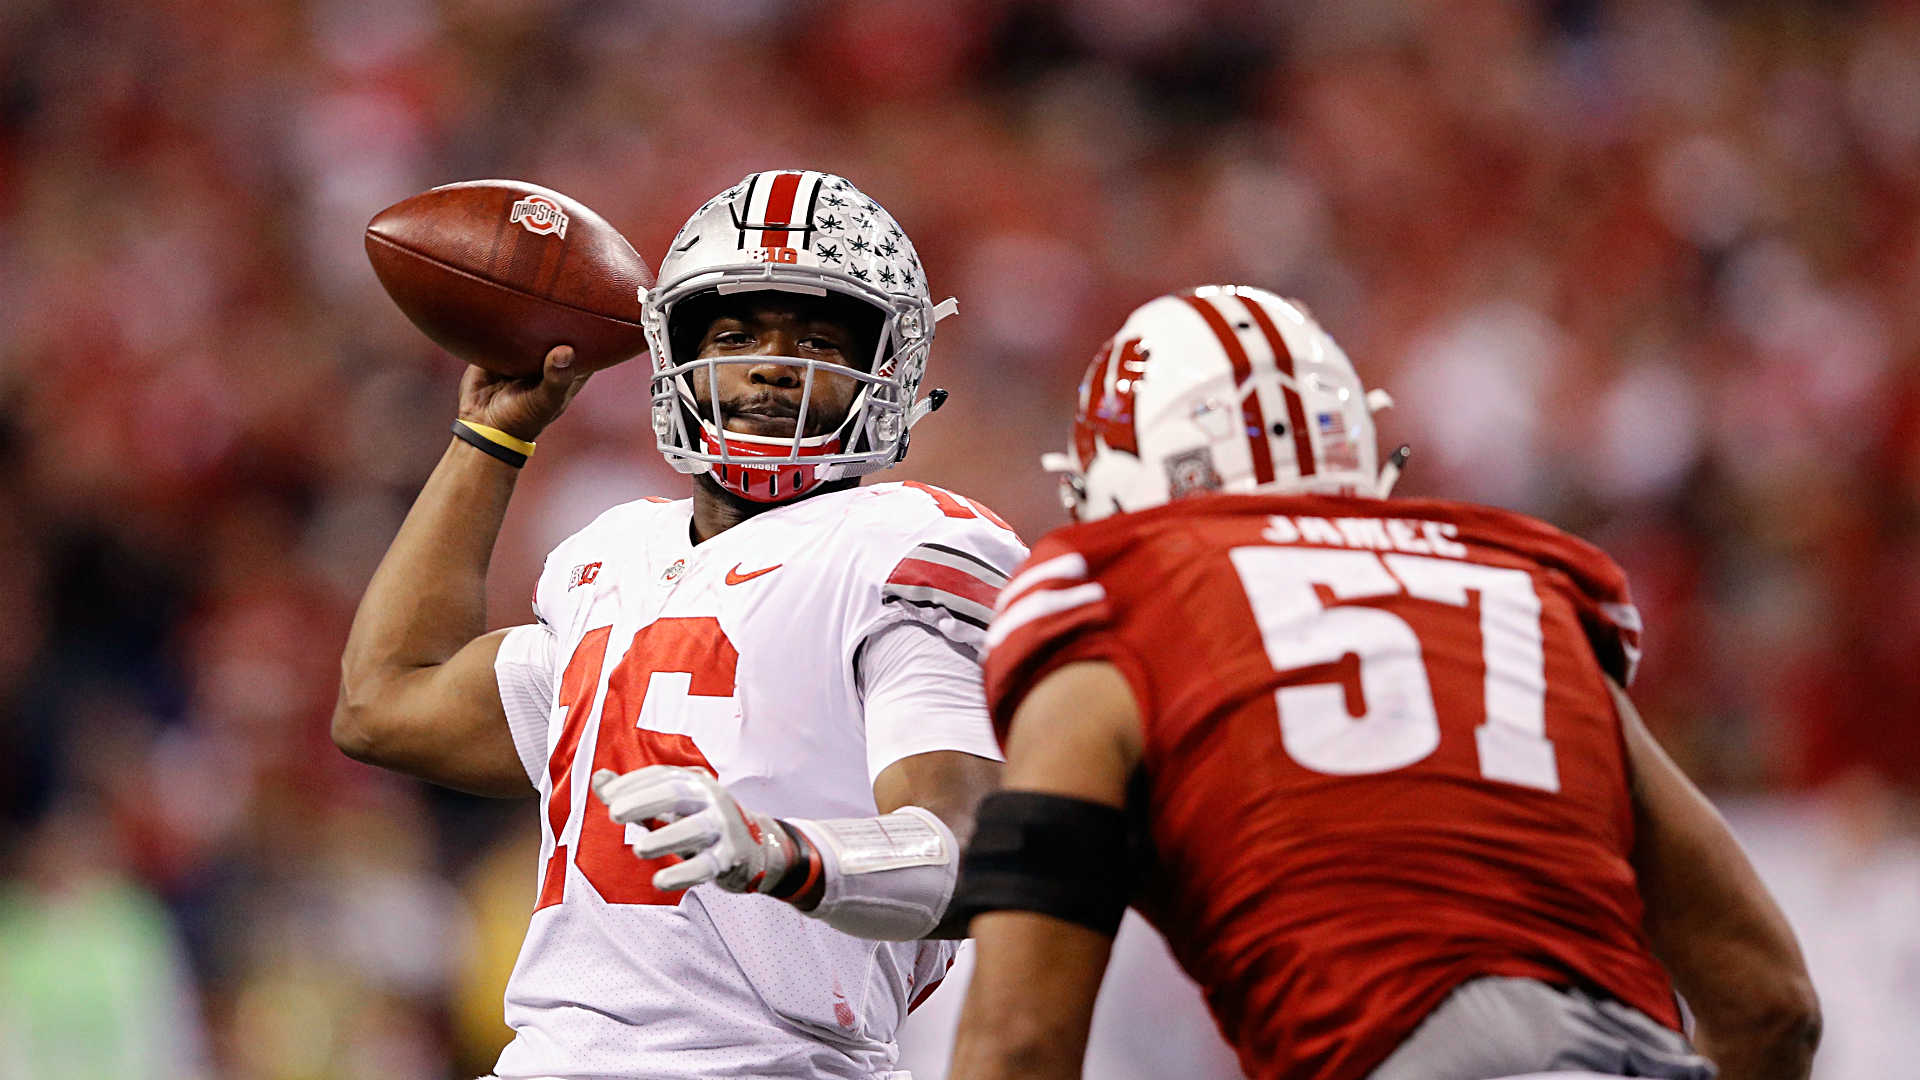 Big Ten championship: J.T. Barrett, Ohio State still standing after win vs. Wisconsin